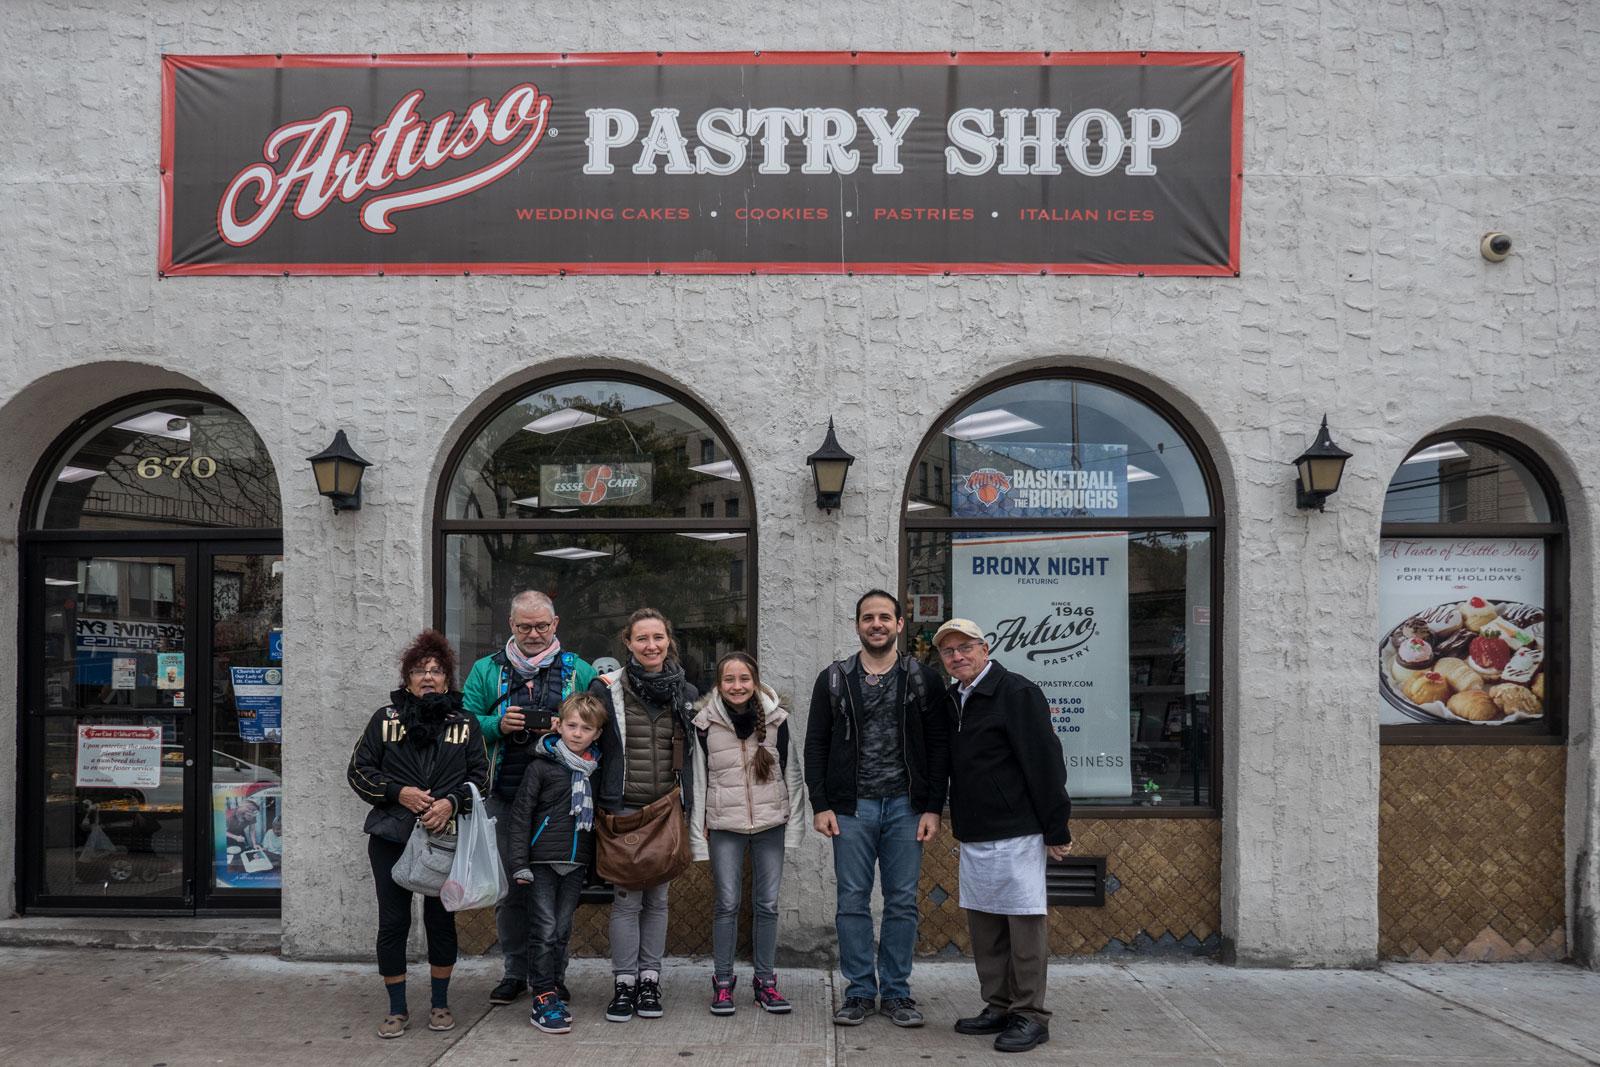 Artuso Pastry Shop Bronx NYC